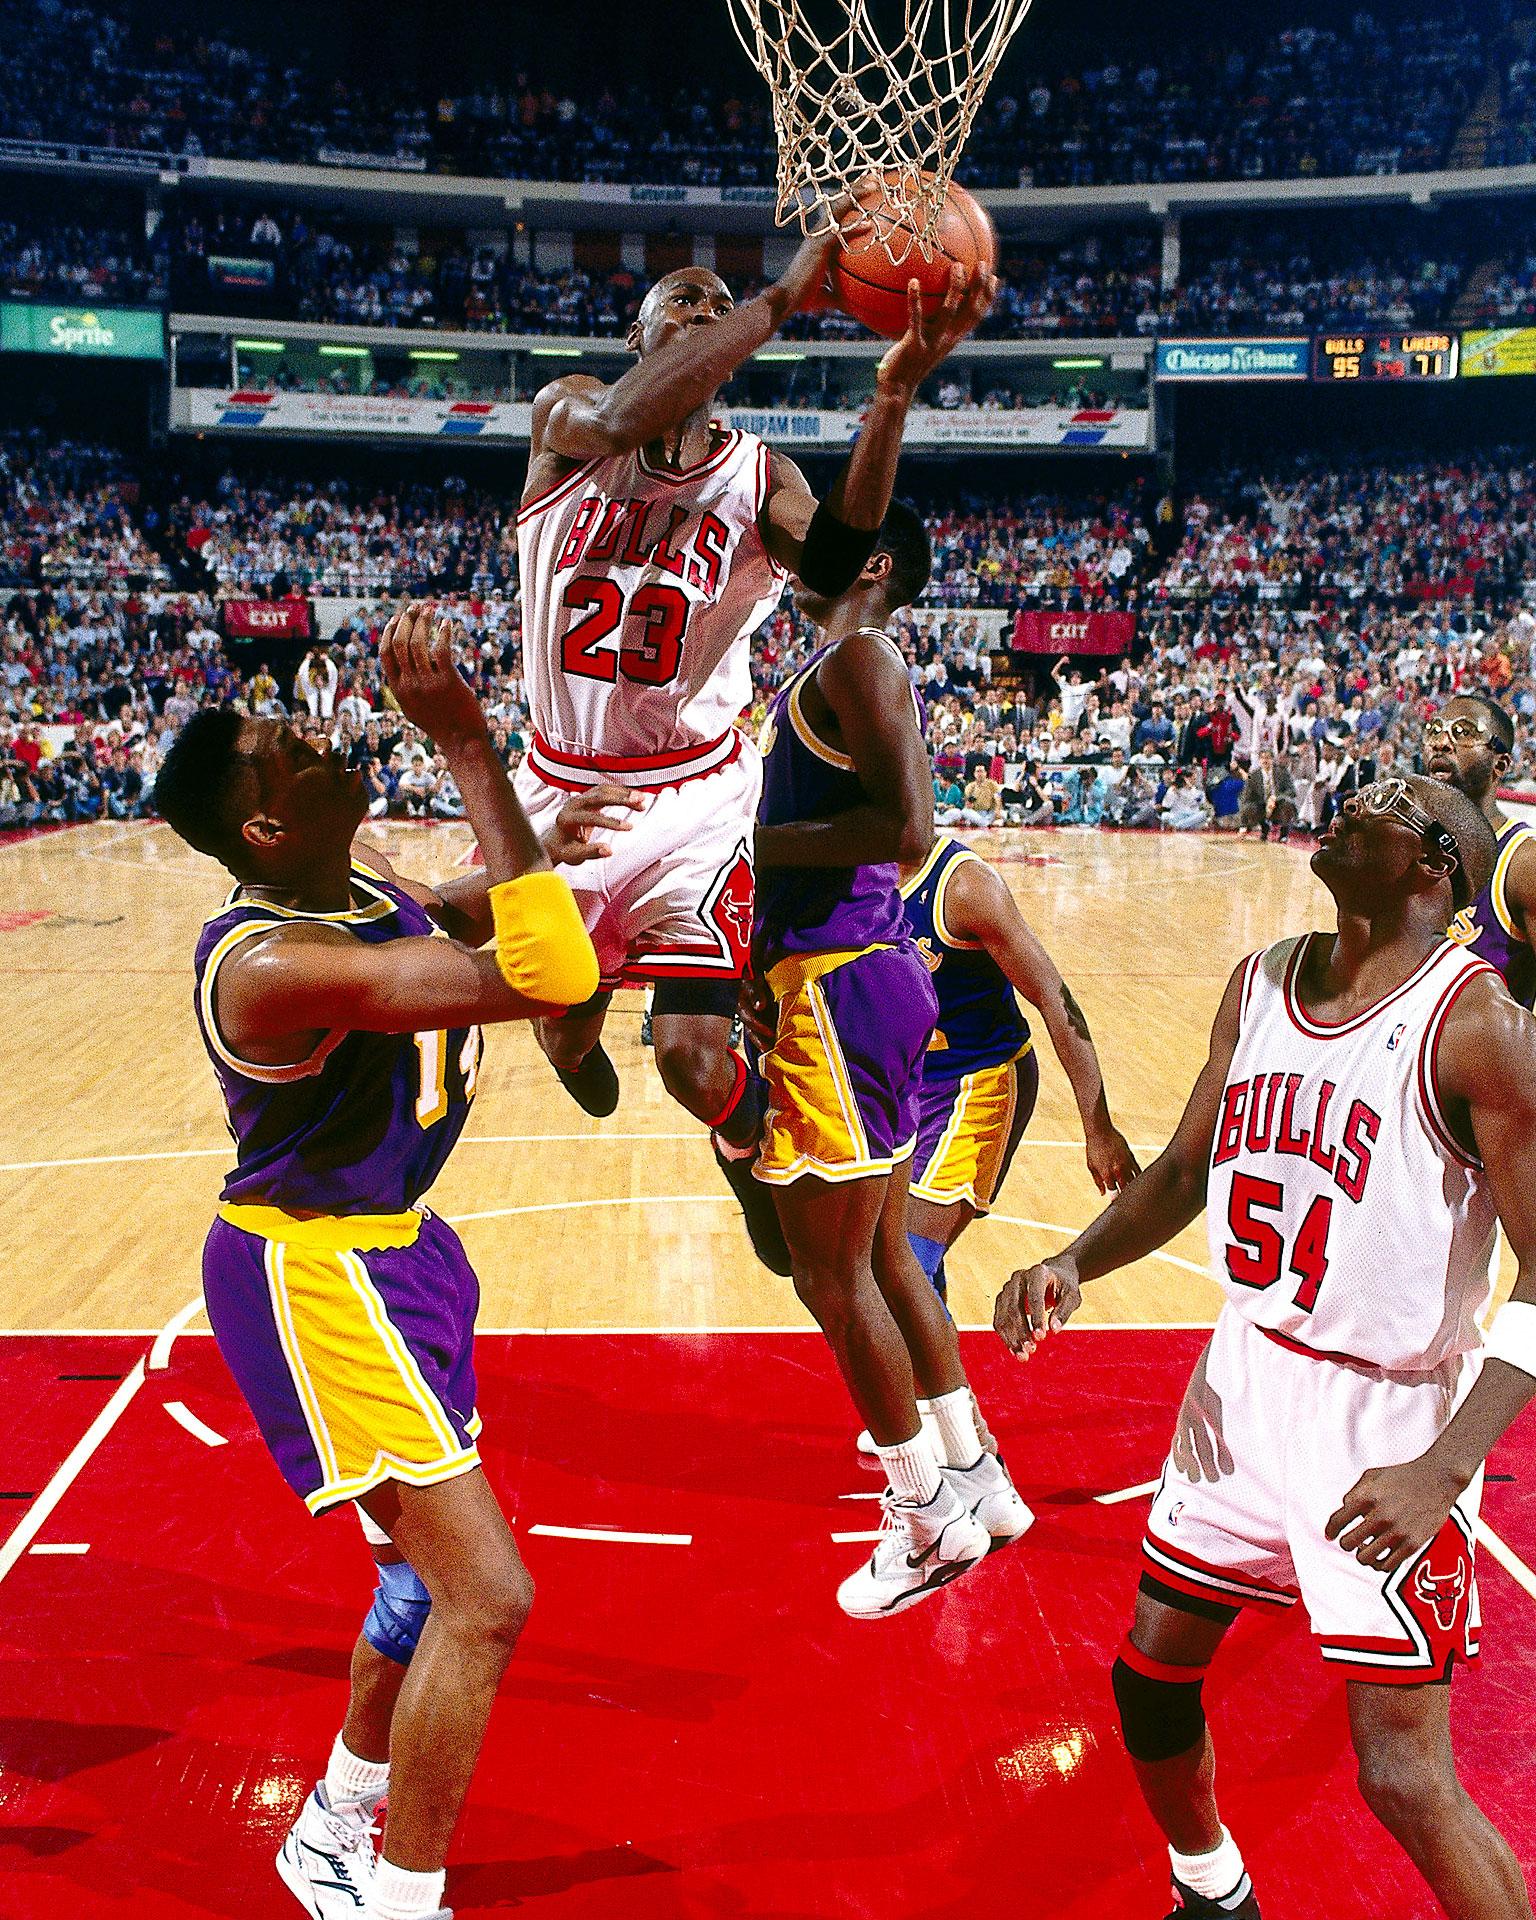 outlet store fc15c ddd6b 49. Heat Retire No. 23 - Michael Jordan 50 Greatest Moments ...